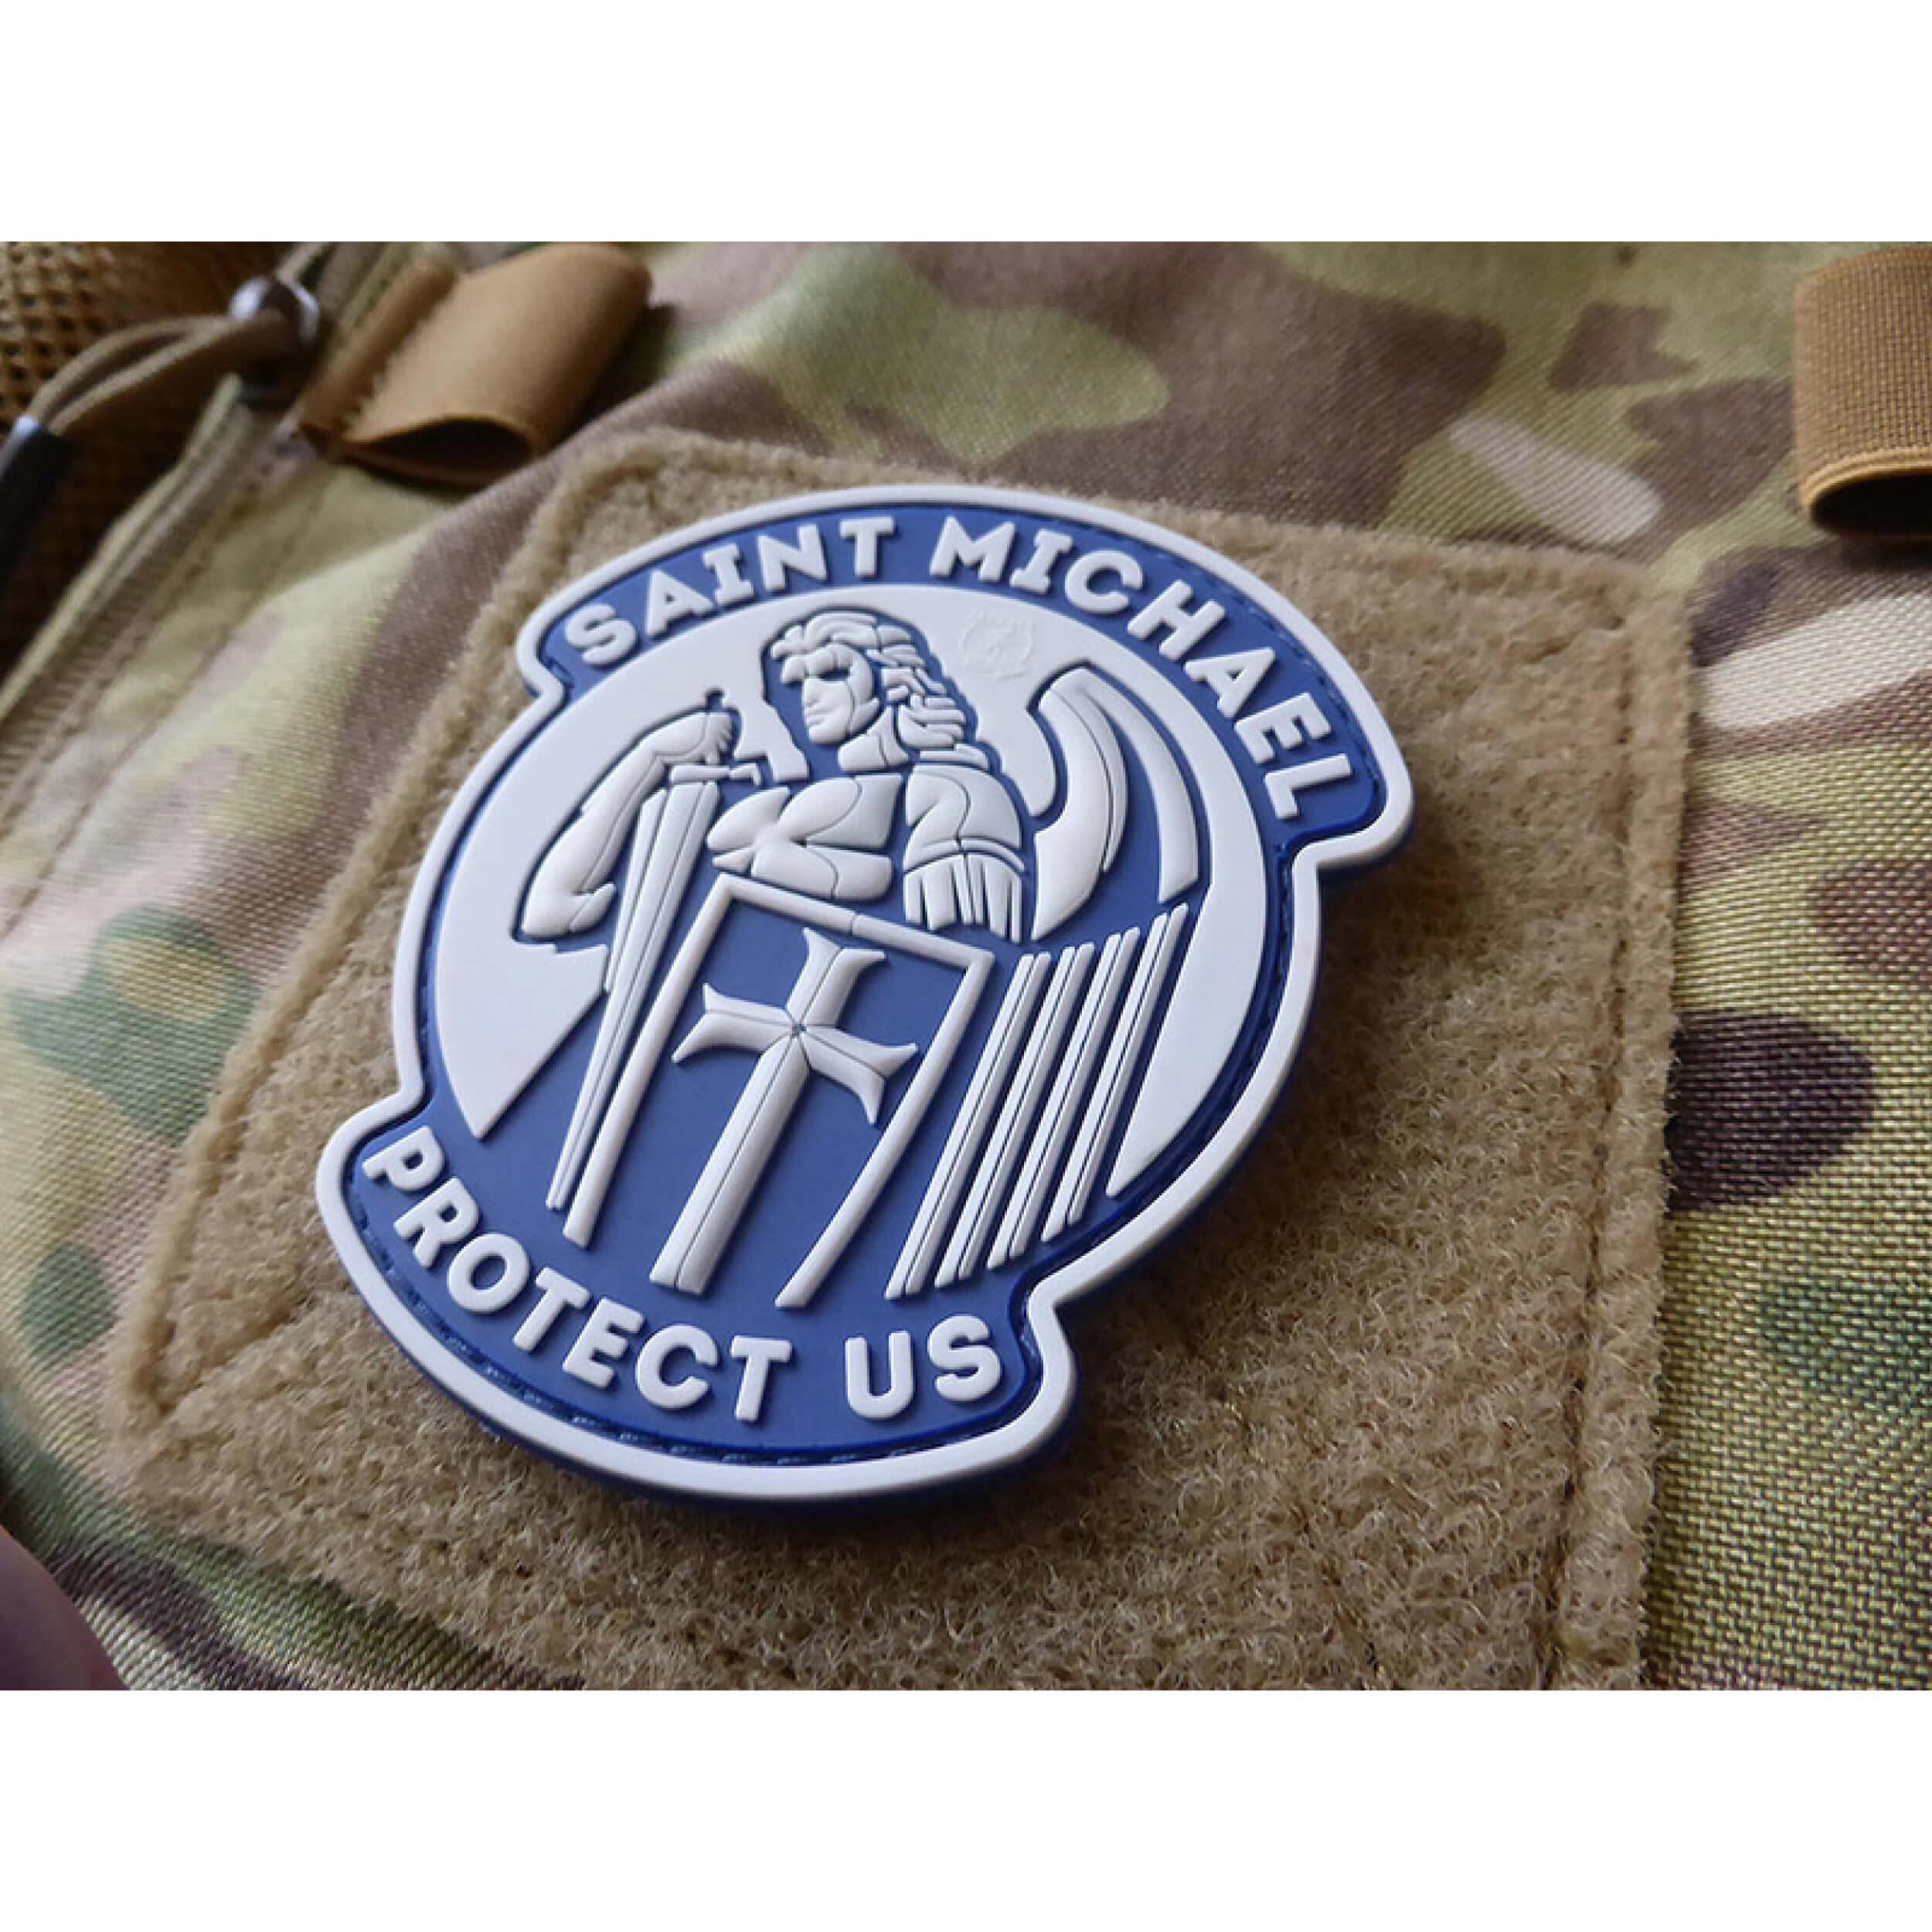 JTG SAINT MICHAEL PROTECT US Patch, lightblue (gb)